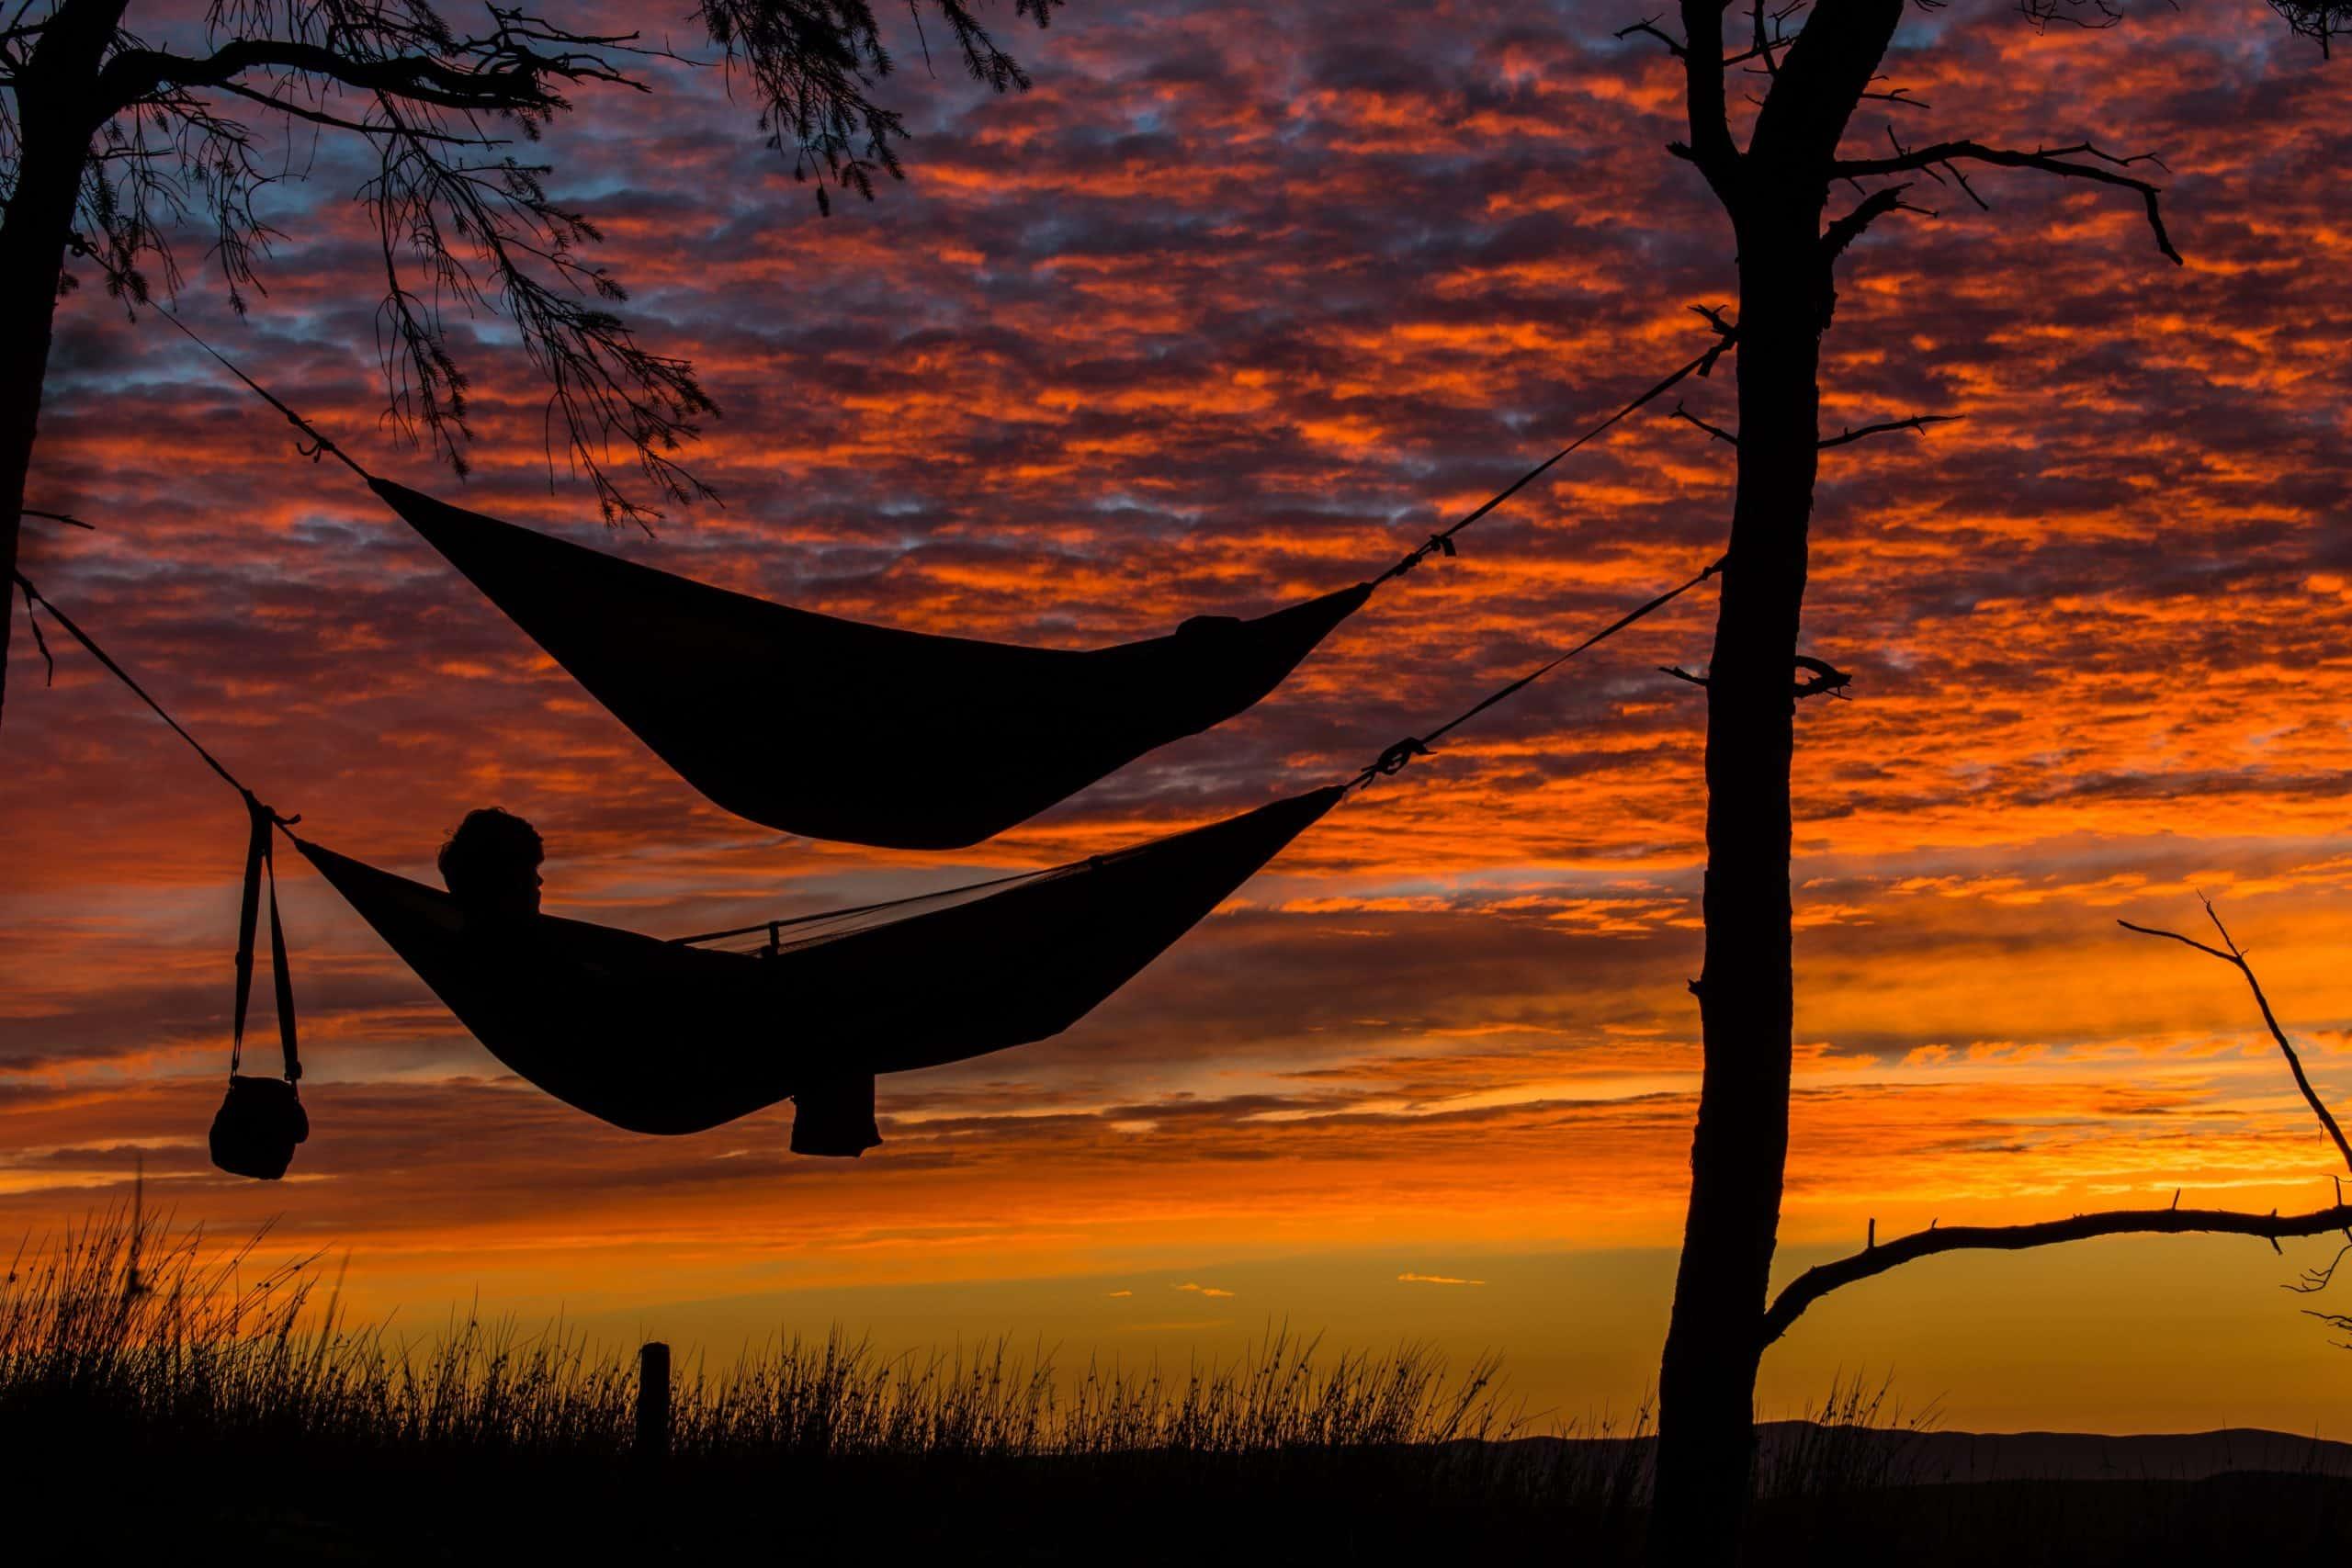 beach with hammocks at sunset